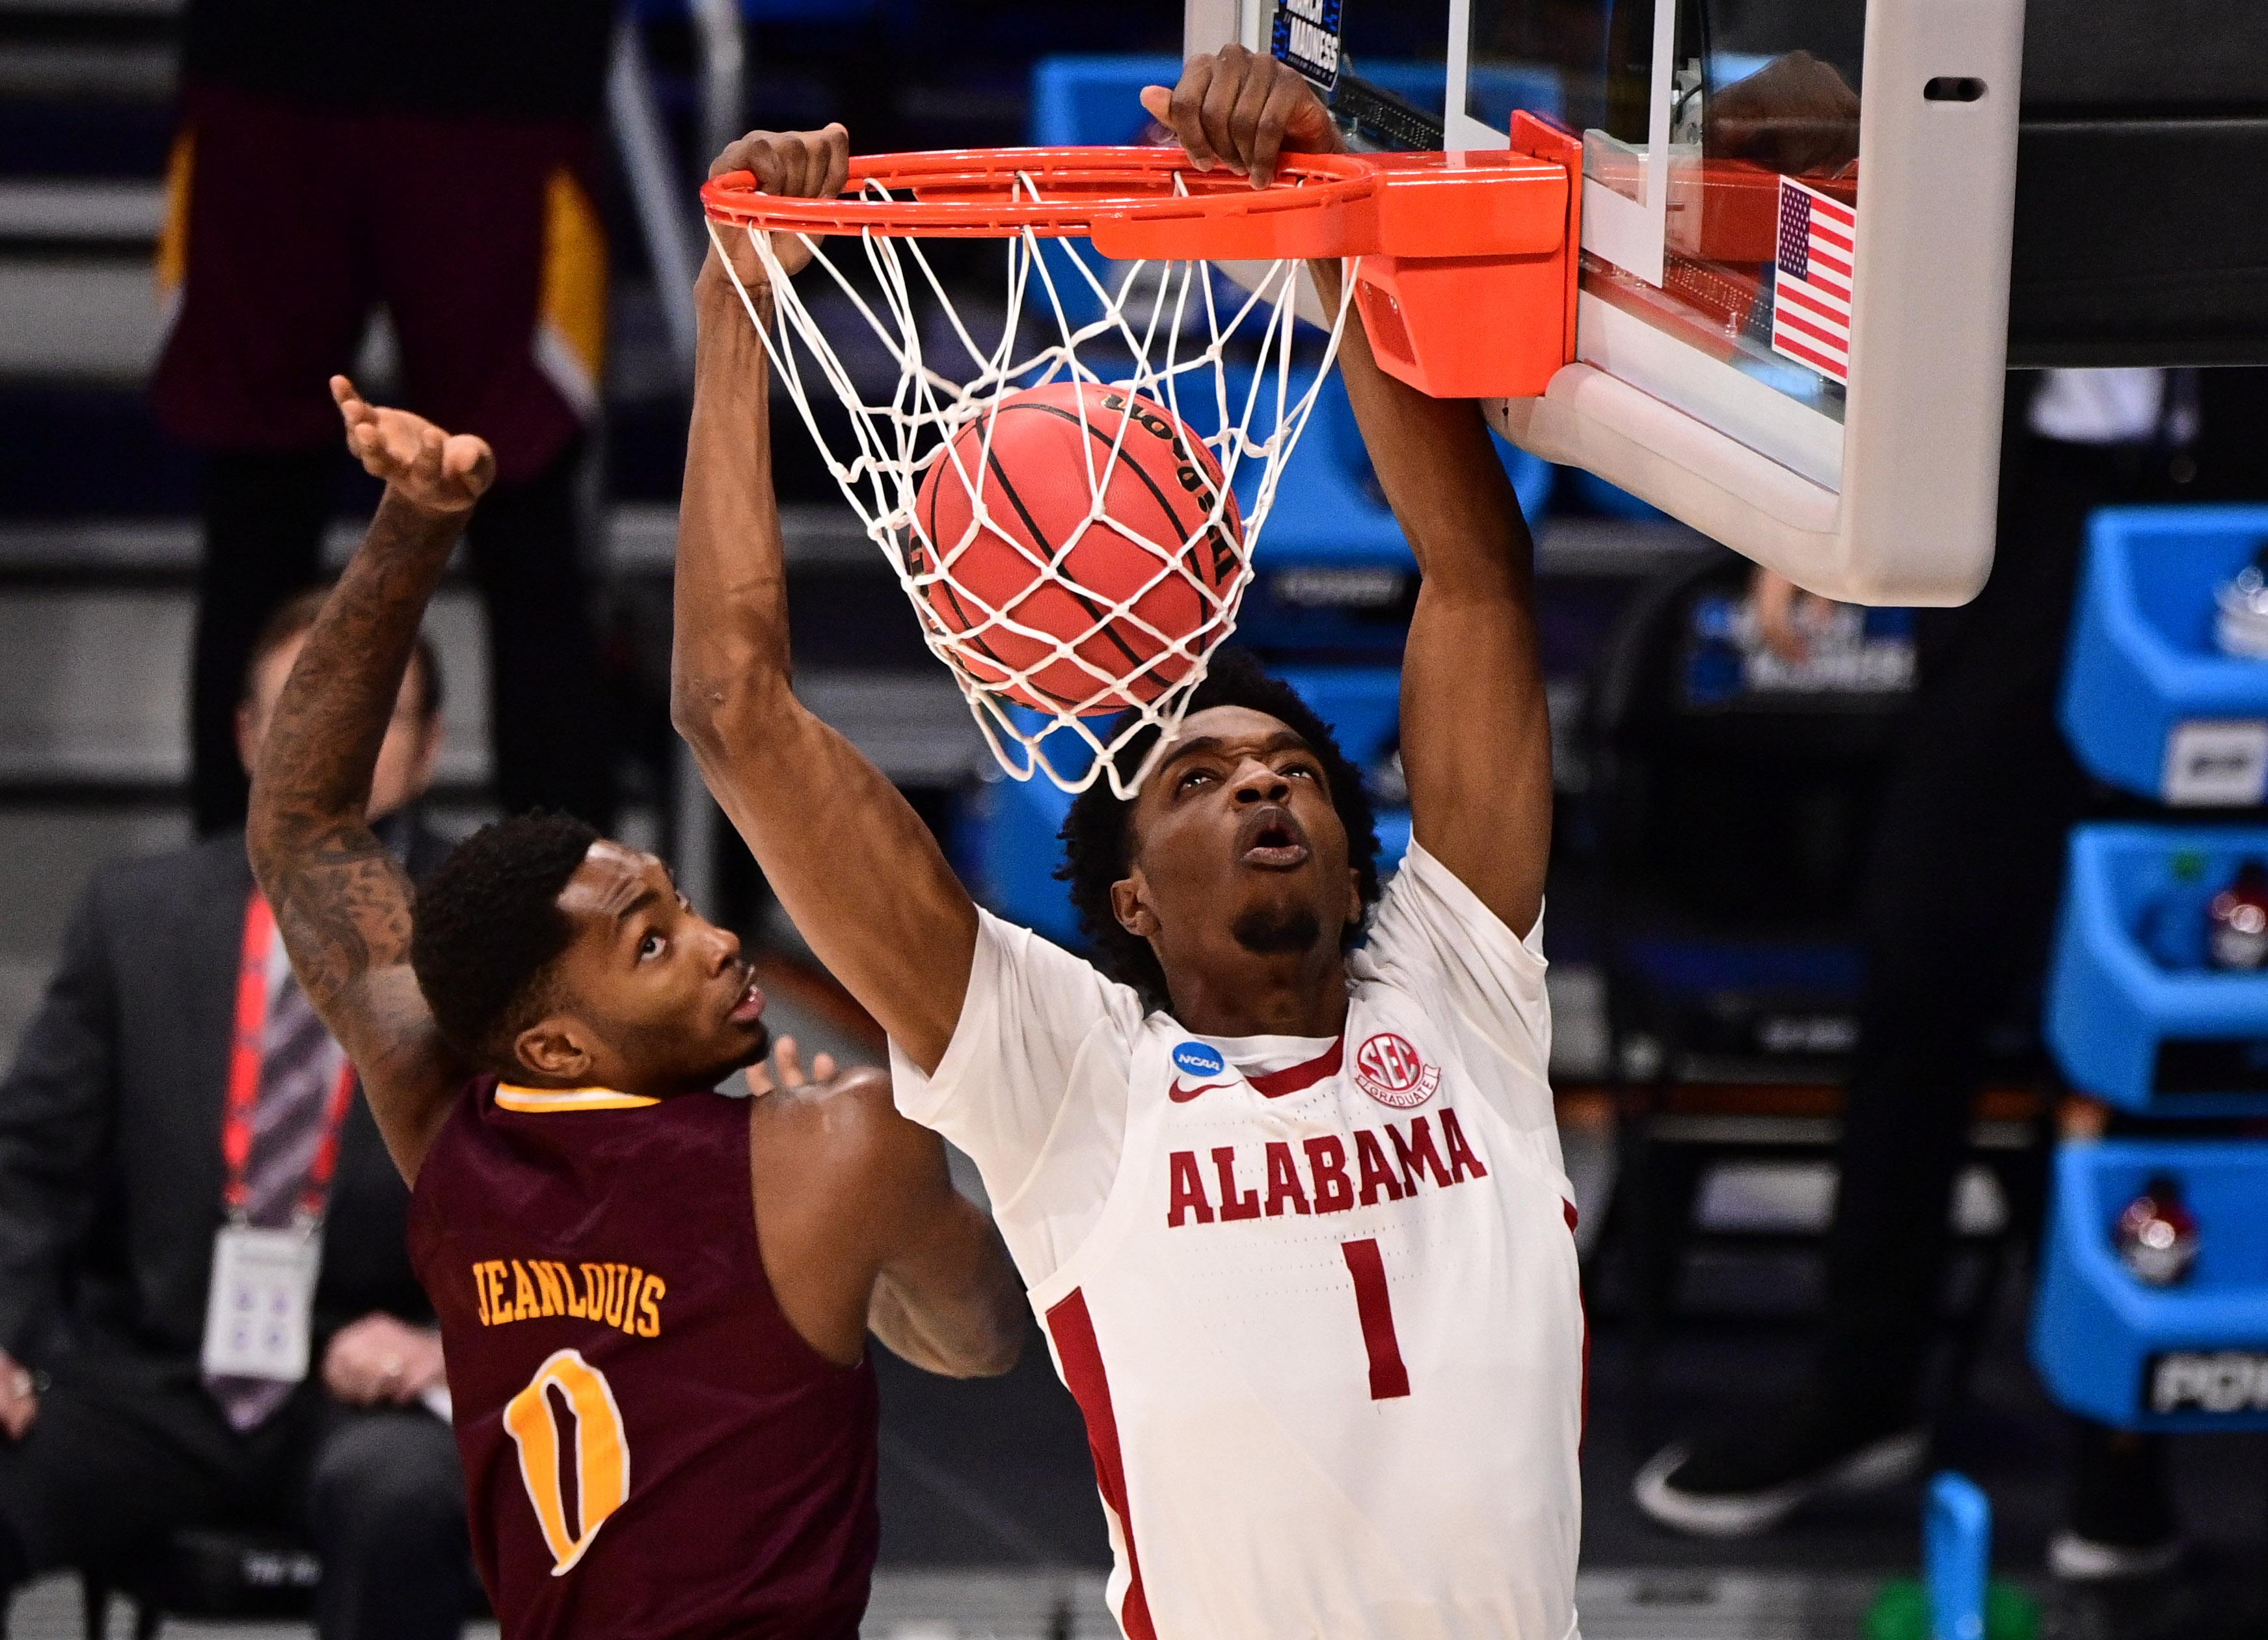 "<p zoompage-fontsize=""15"" style="""">NCAA Basketball: NCAA Tournament-Iona at Alabama"